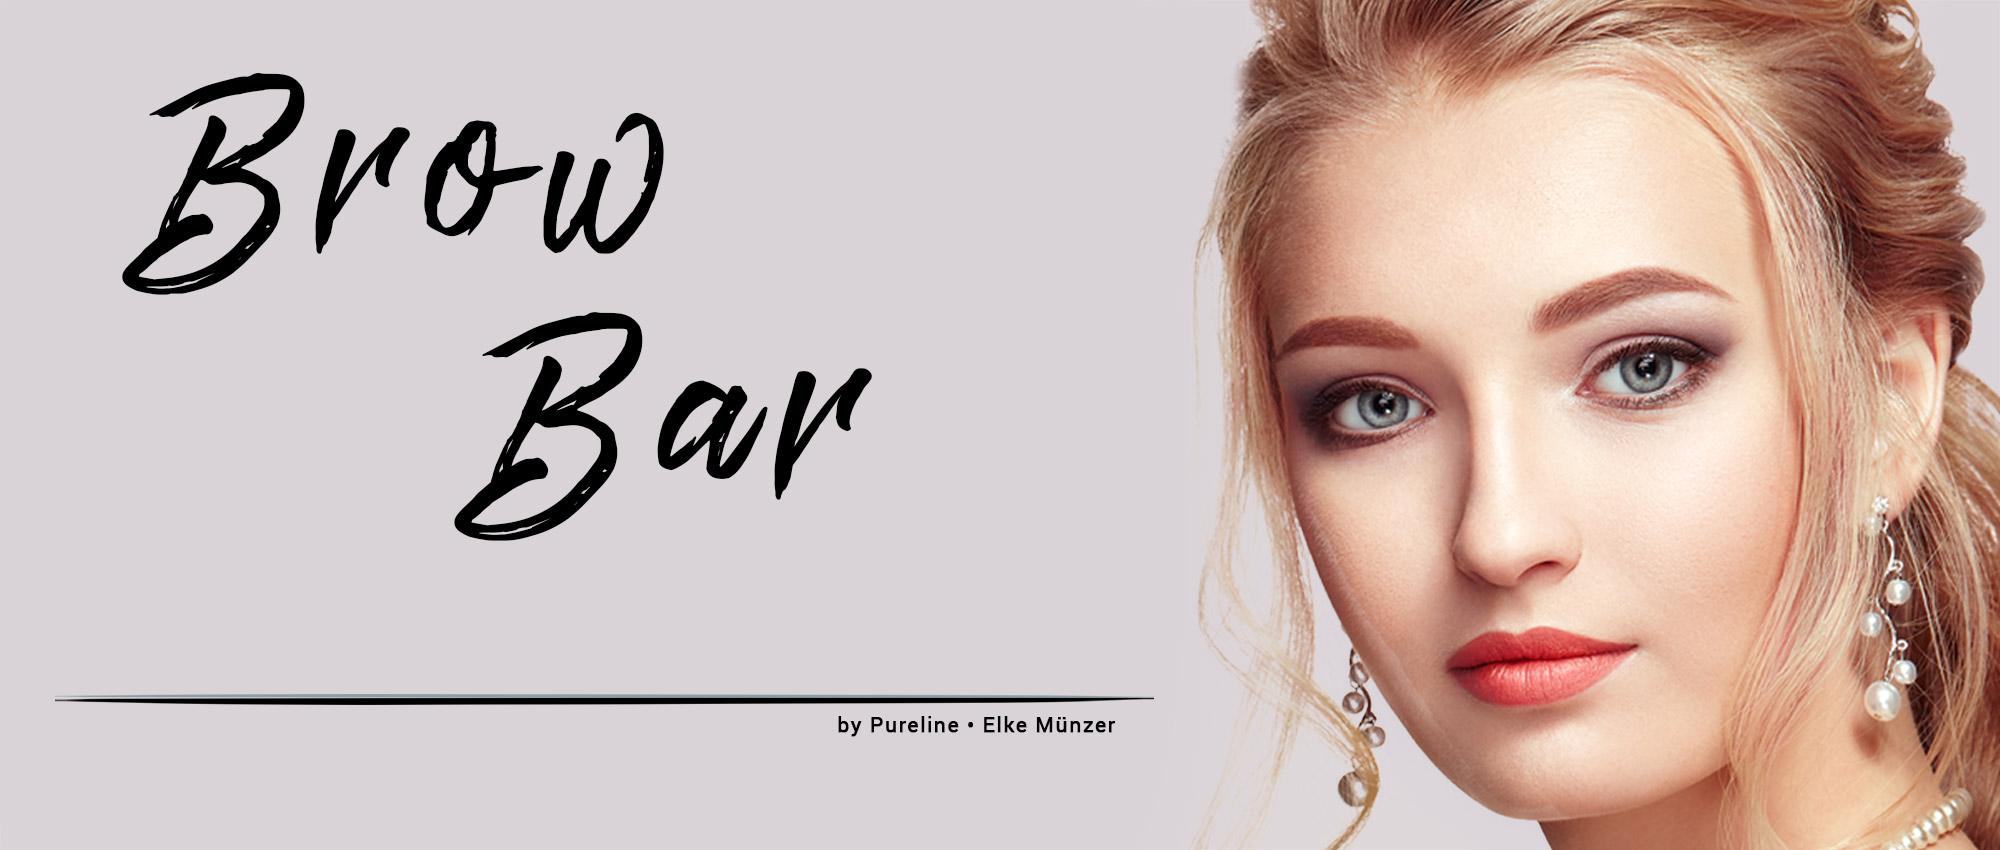 Brow Bar - Teaser